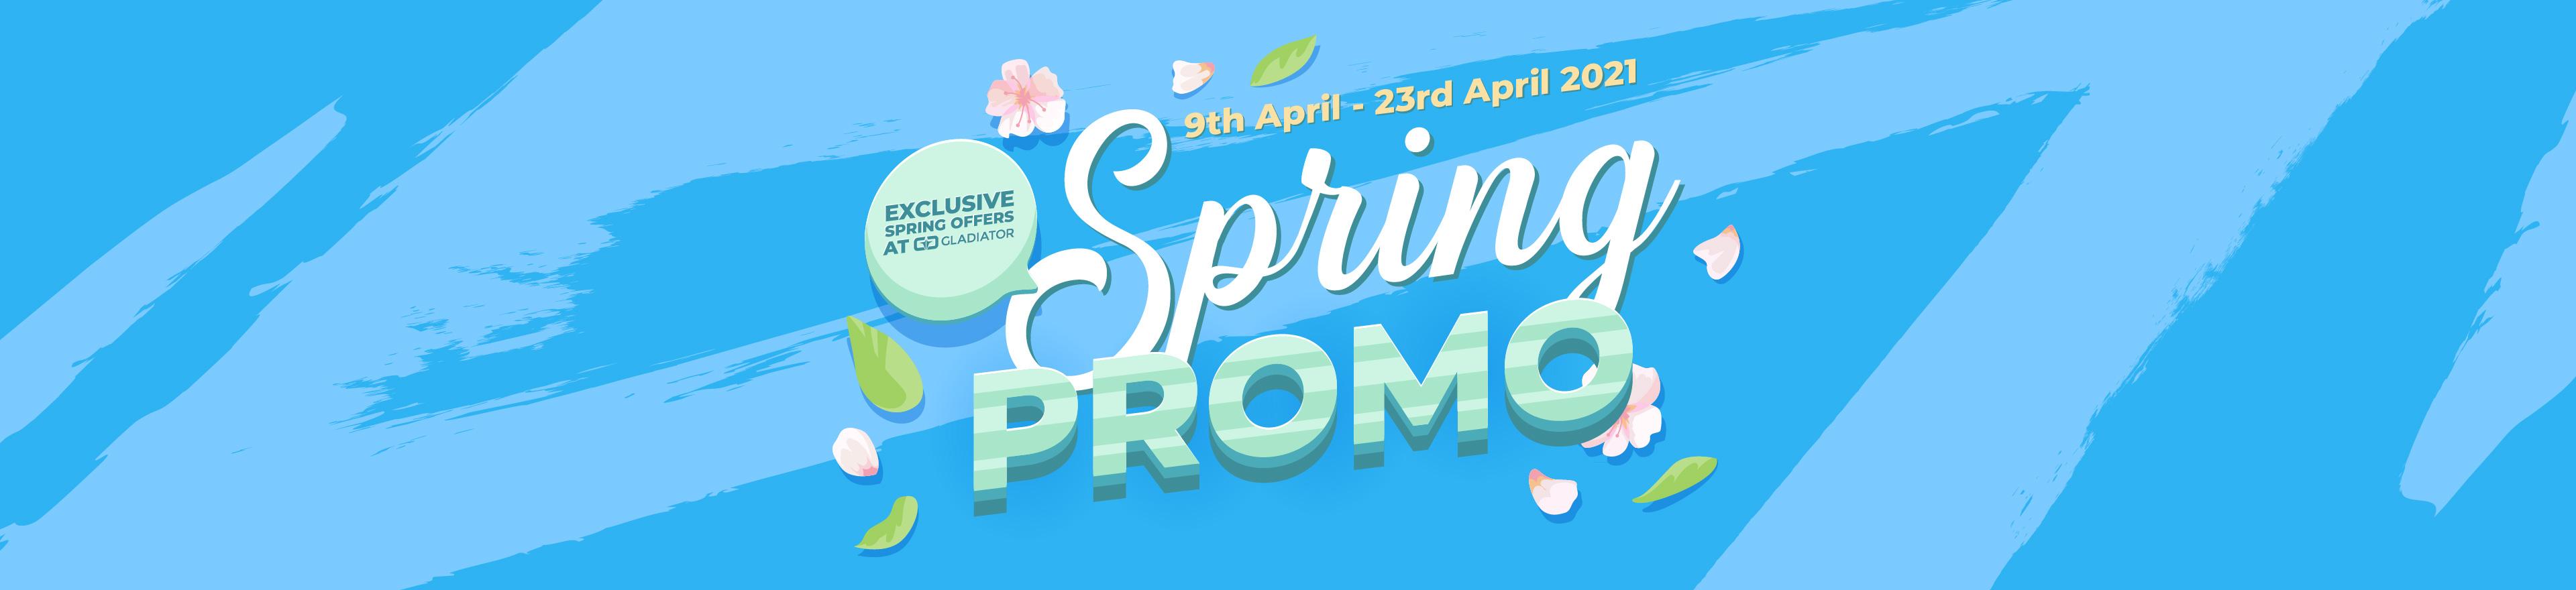 Spring Promo 2021